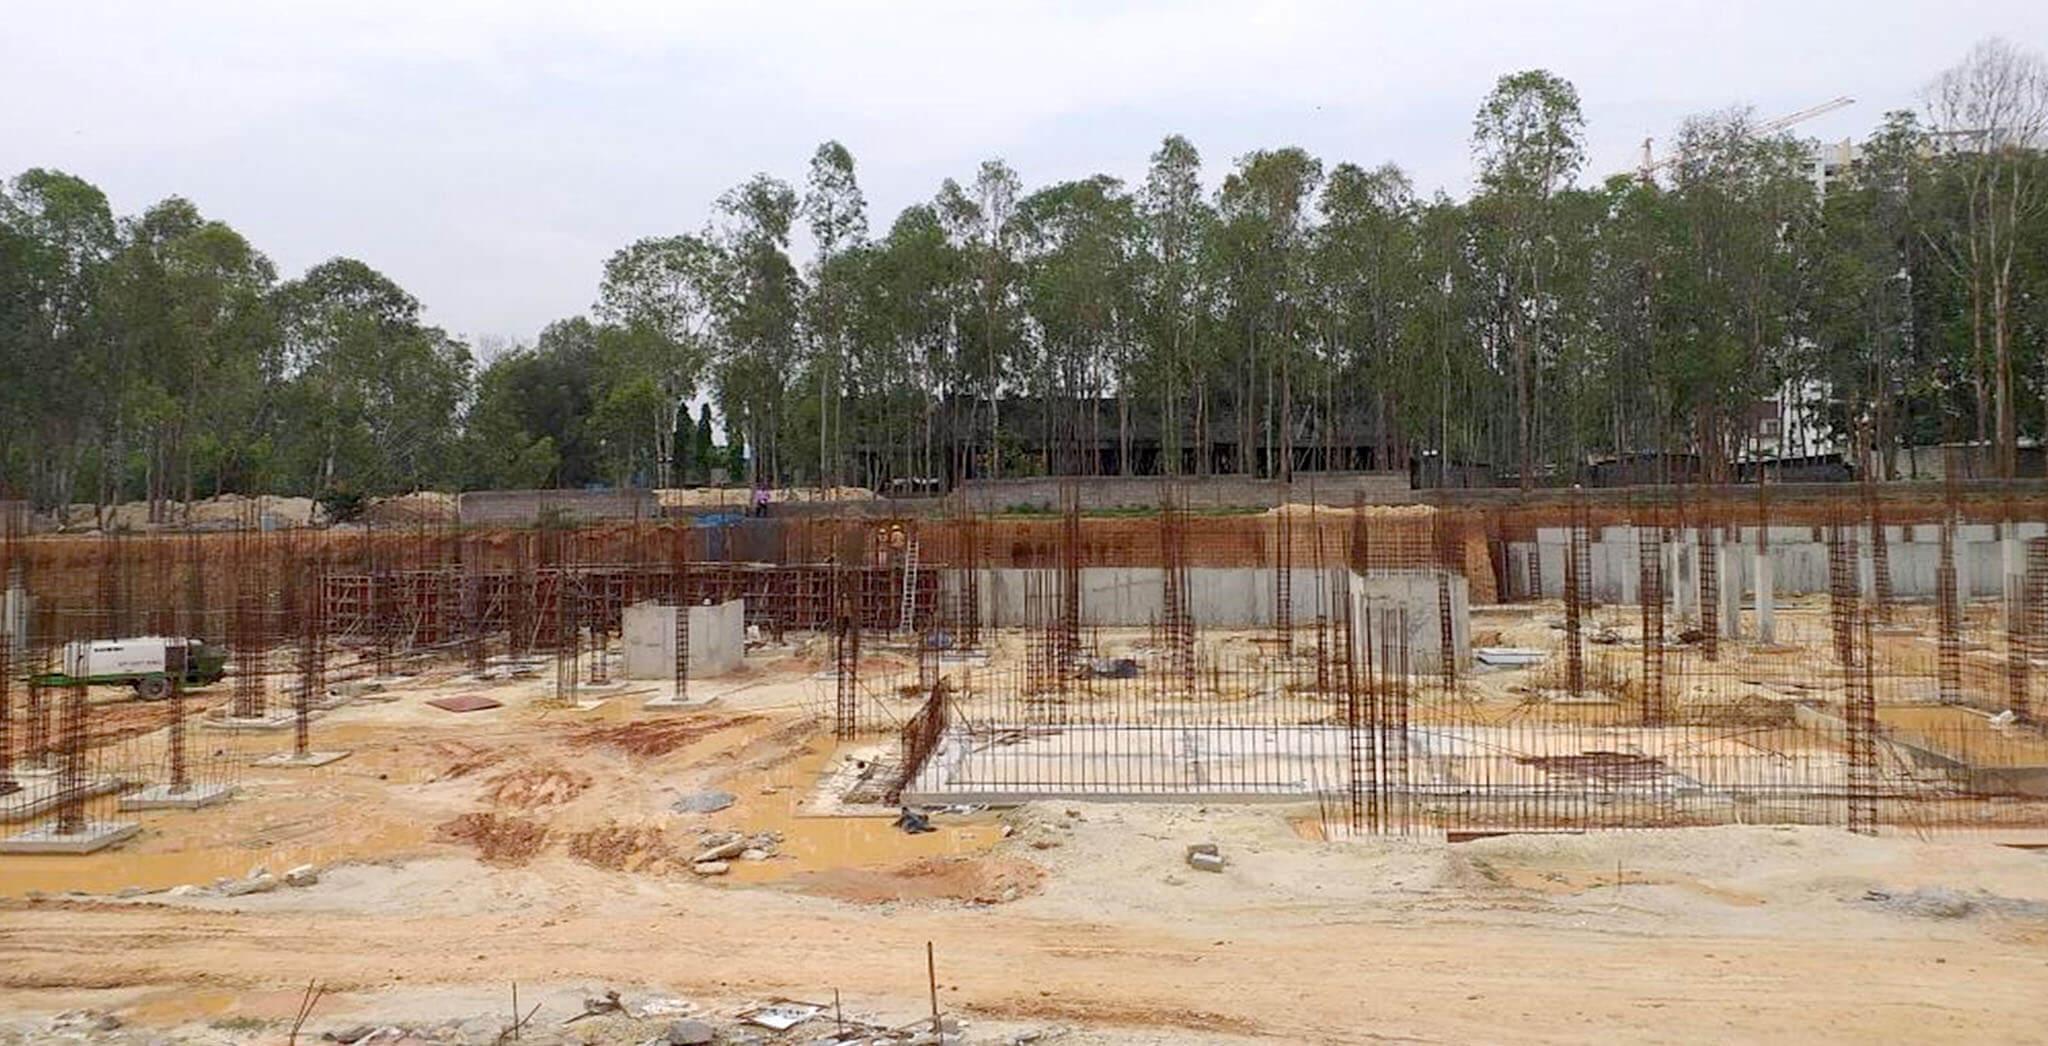 Jun 2019 - North side view